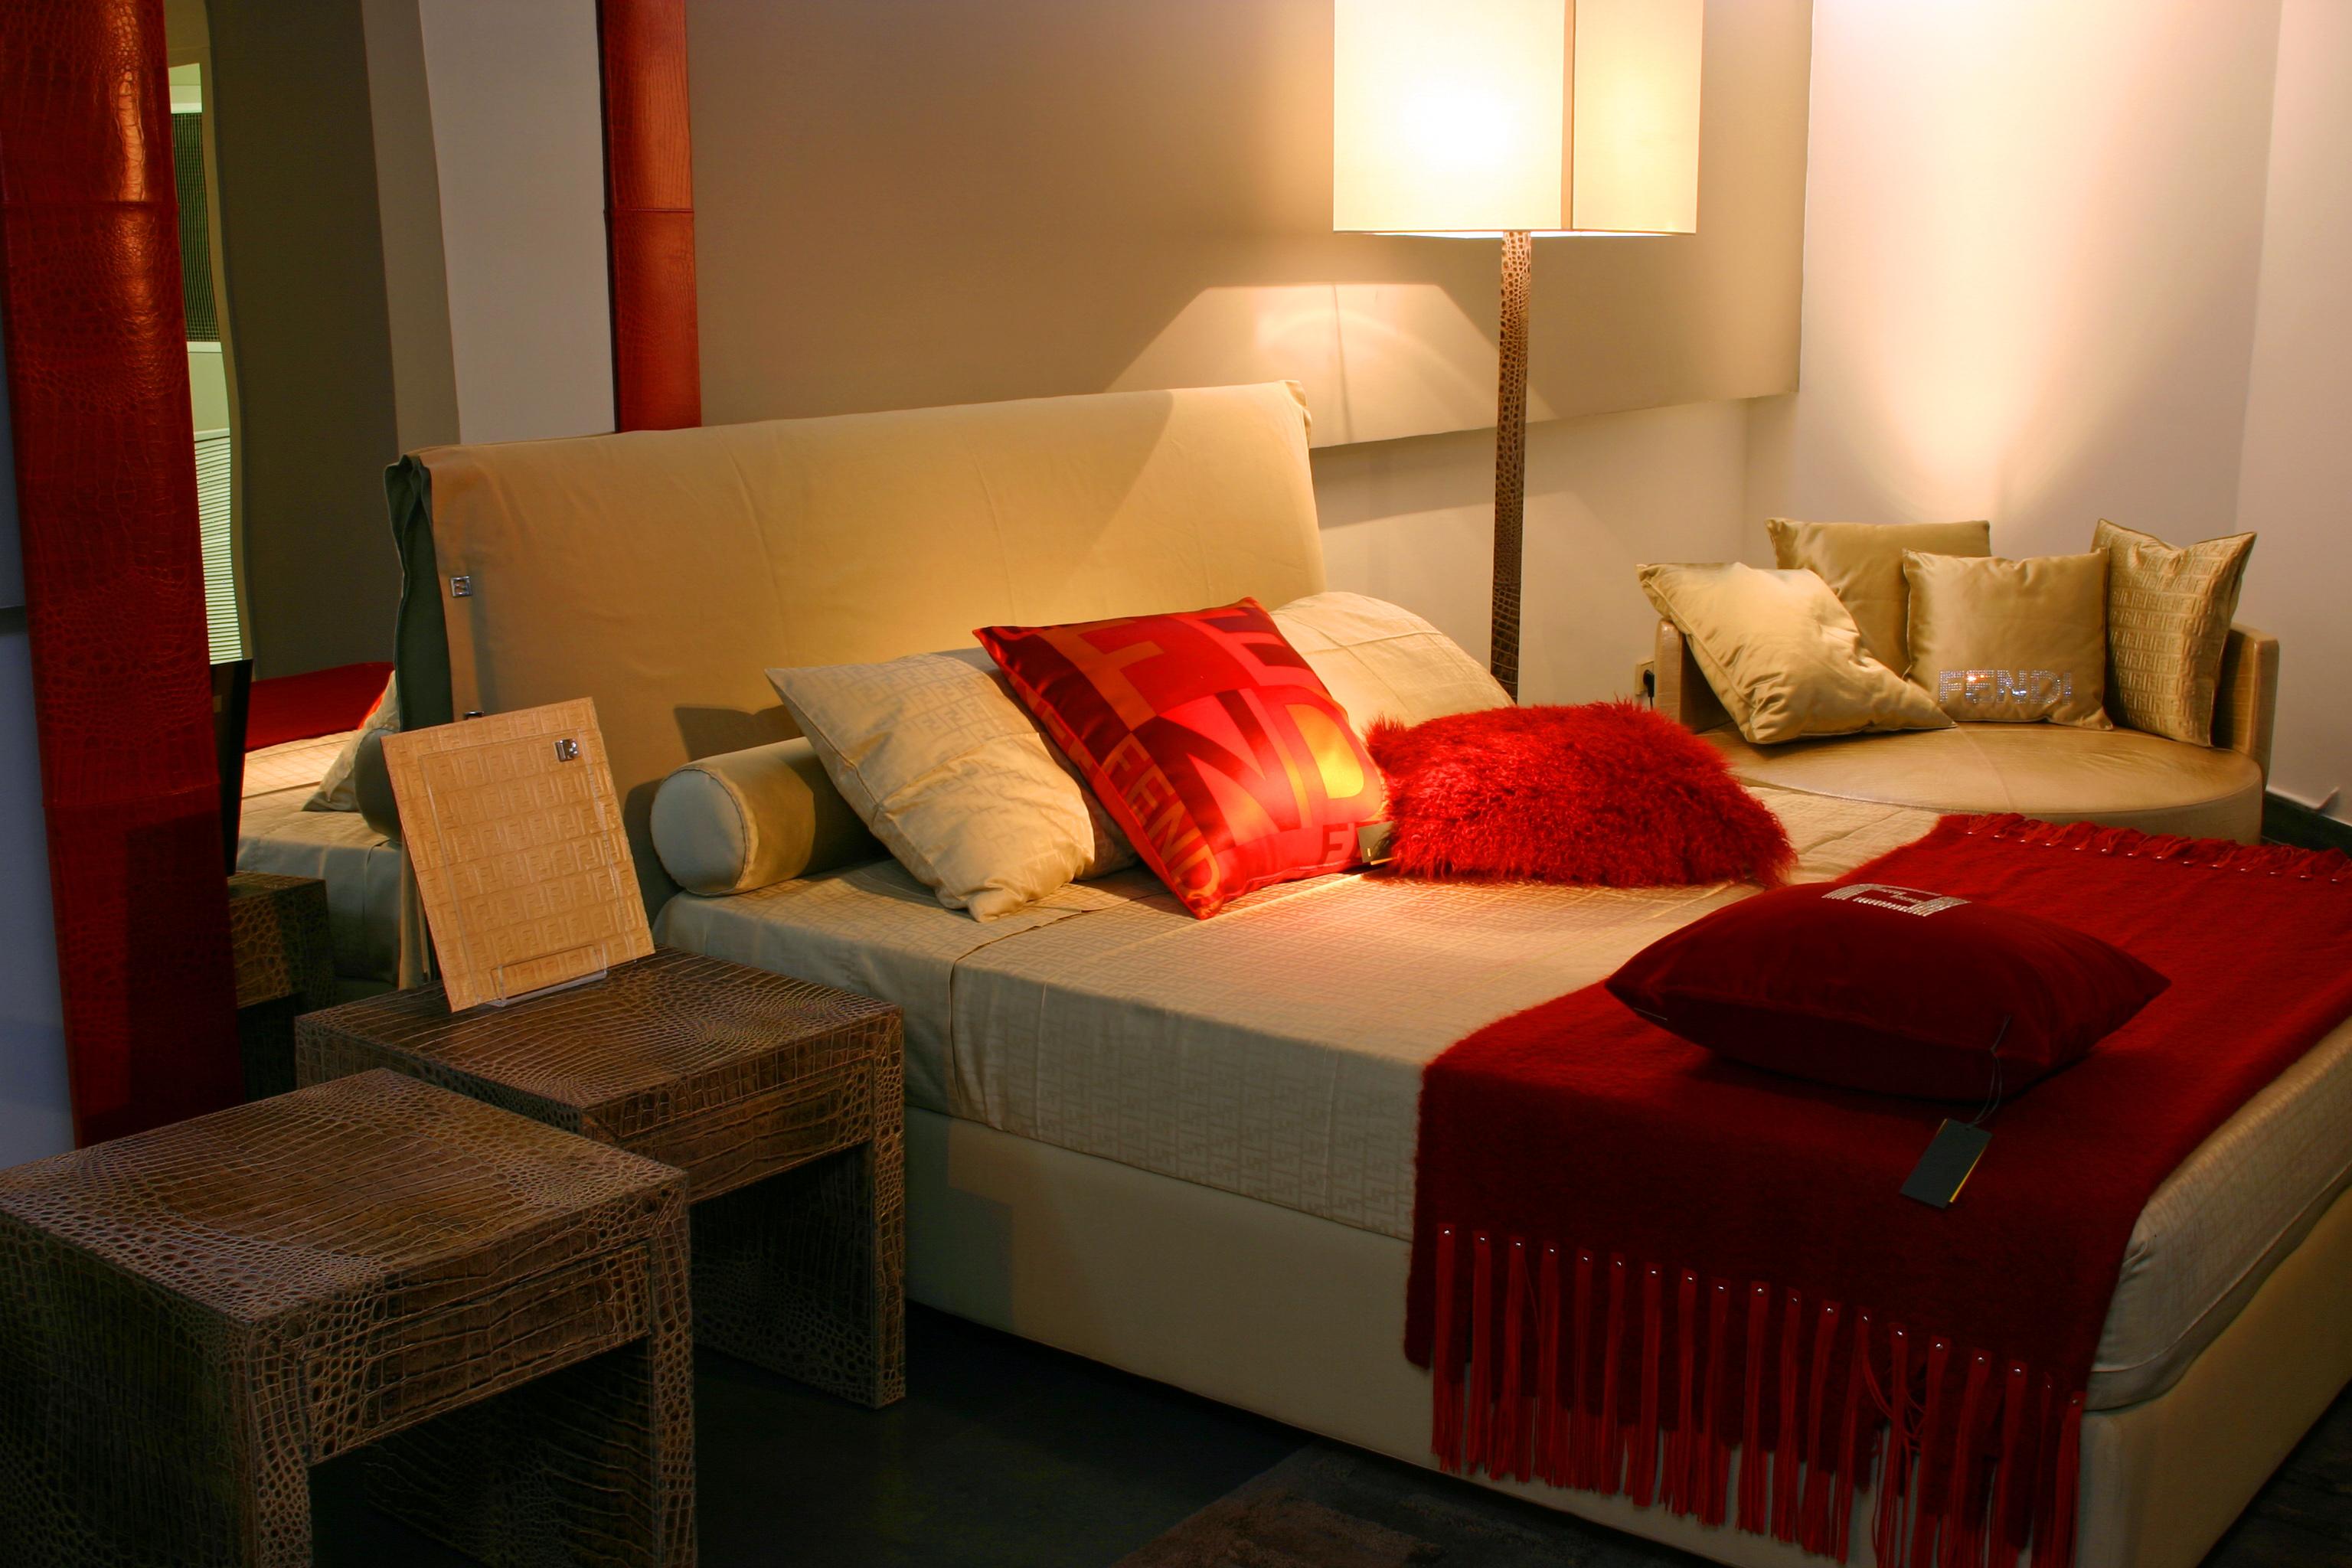 Chambre a coucher fendi for Chambre d artisanat marrakech